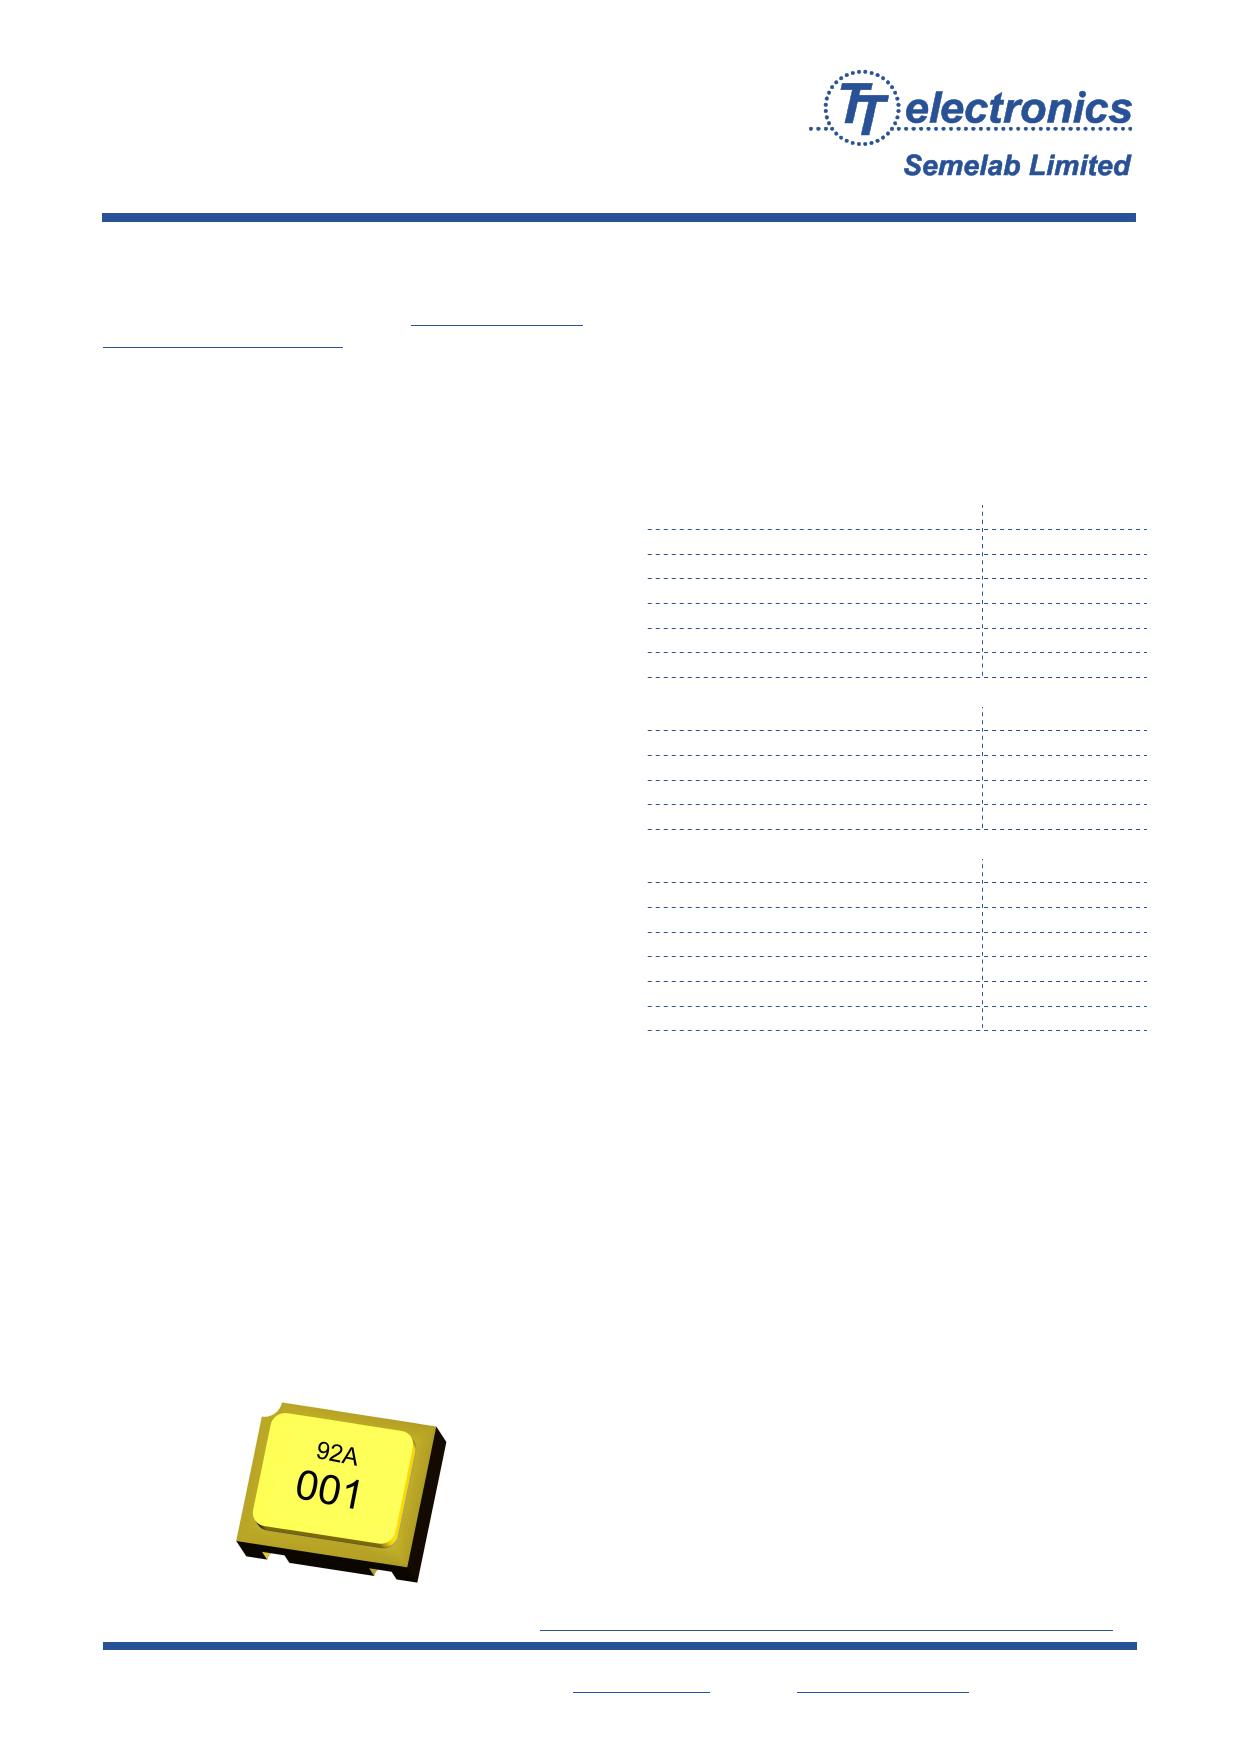 BFR92 pdf, 반도체, 판매, 대치품